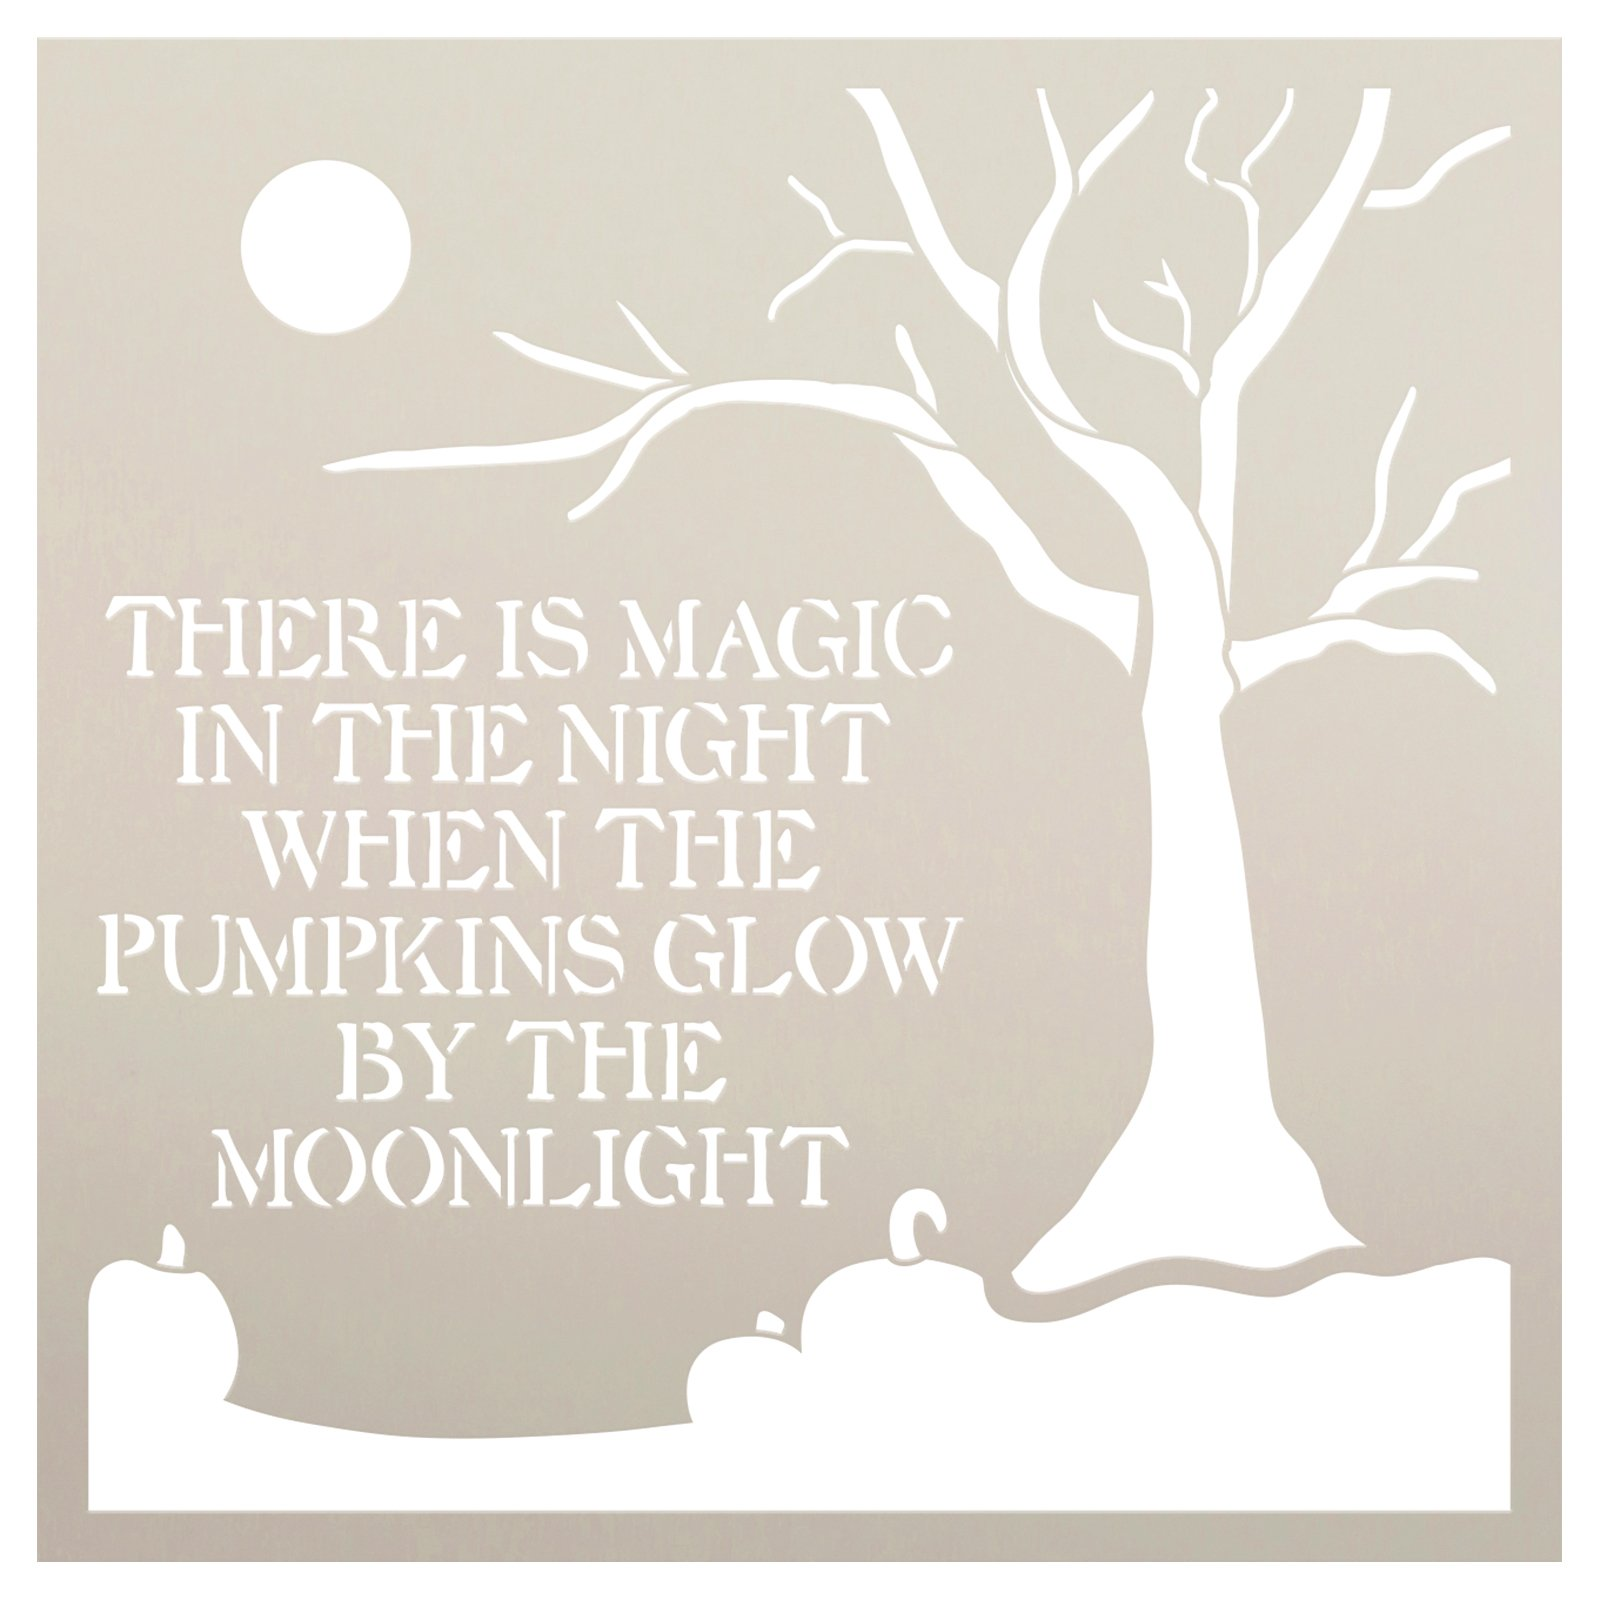 Pumpkin by Moonlight Stencil by StudioR12 | Craft DIY Fall Autumn Home Decor | Paint Halloween Wood Sign | Reusable Mylar Template | Select Size